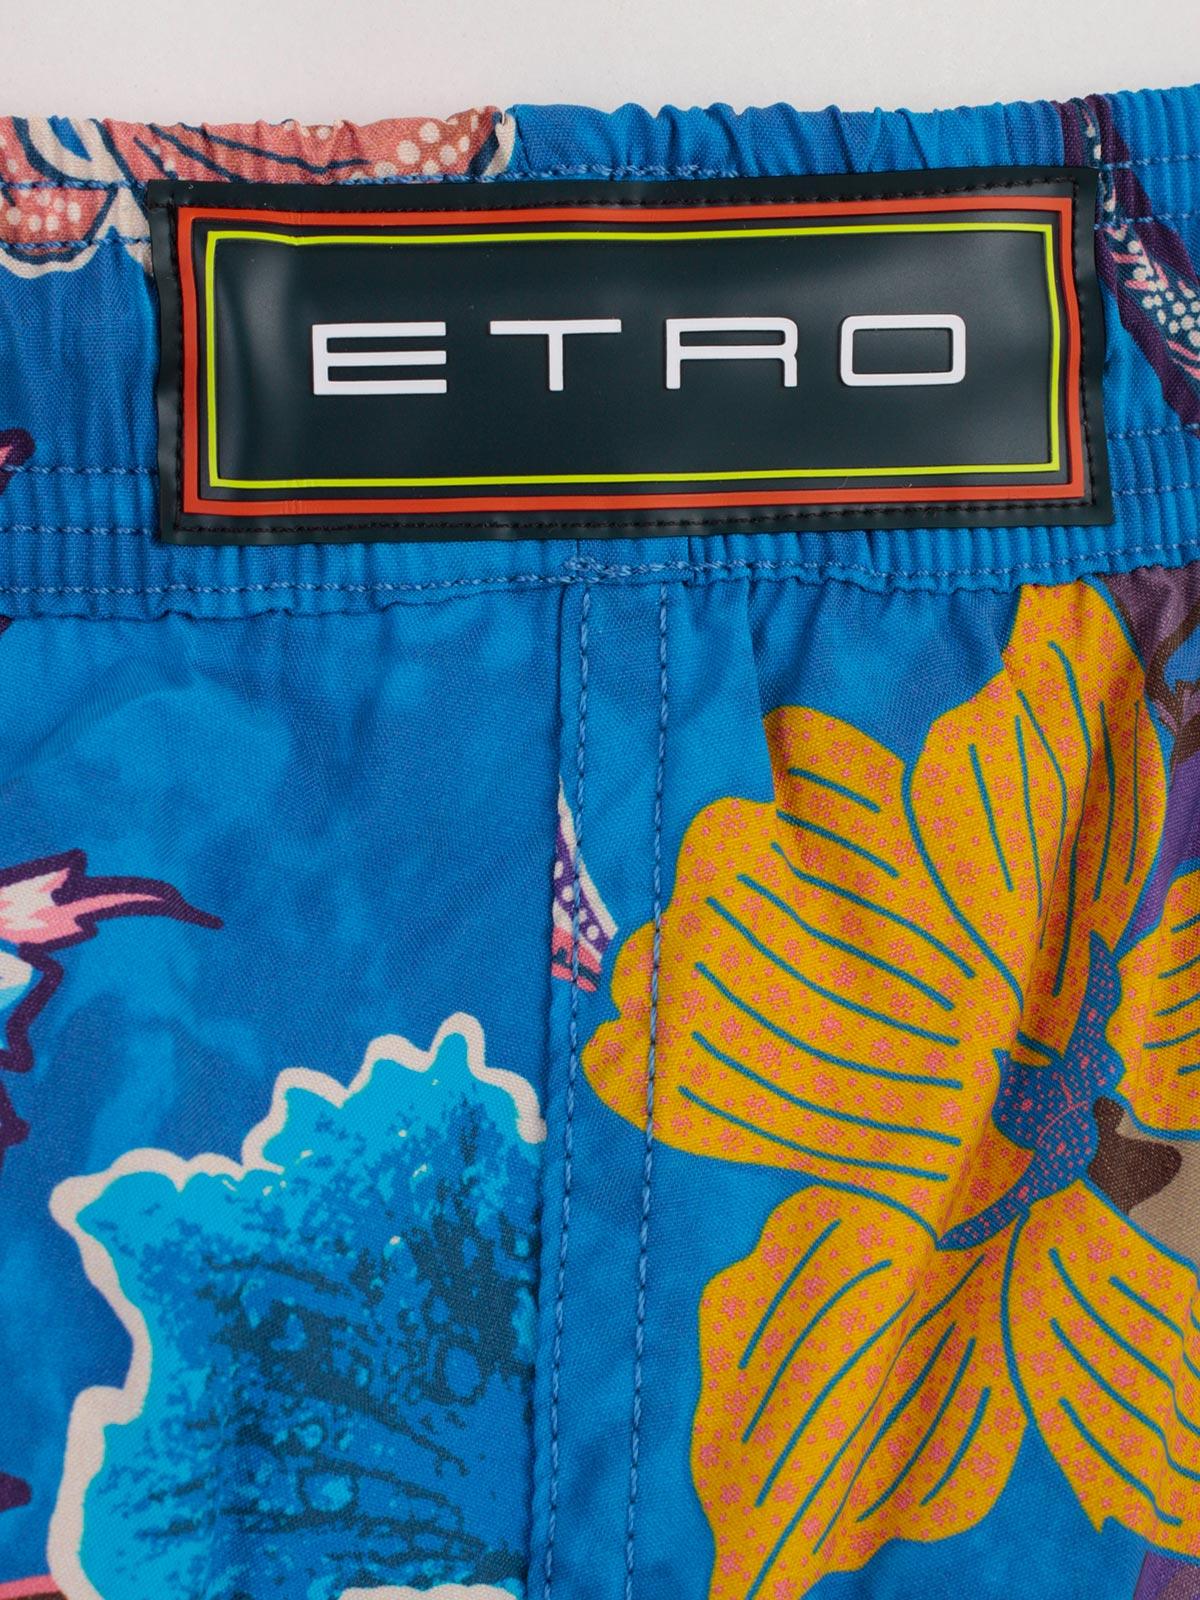 low priced 3fdcf 8e2f0 Etro Costume